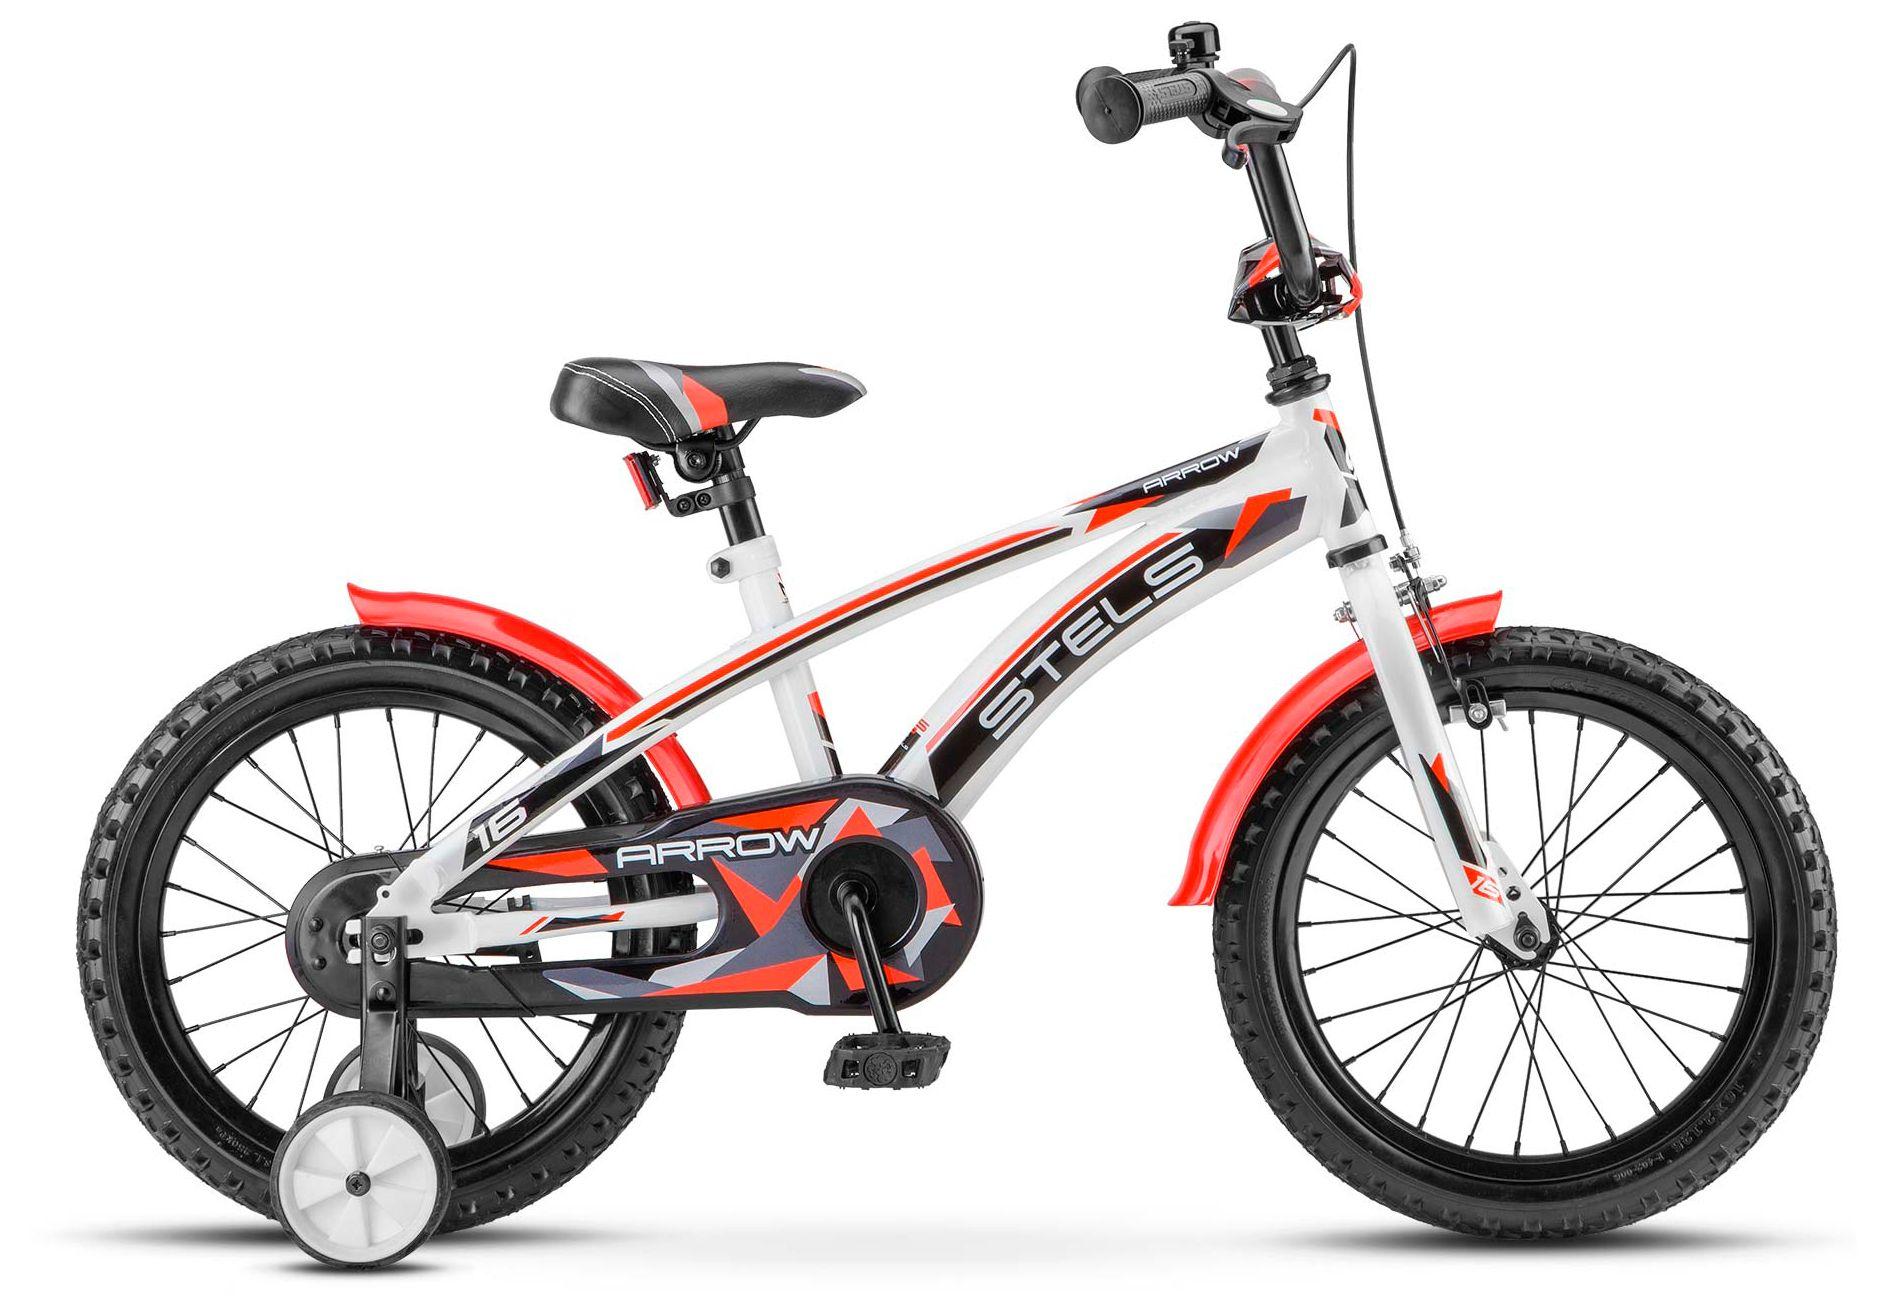 Велосипед Stels Arrow 16 (V020) 2018,  Детские  - артикул:293419